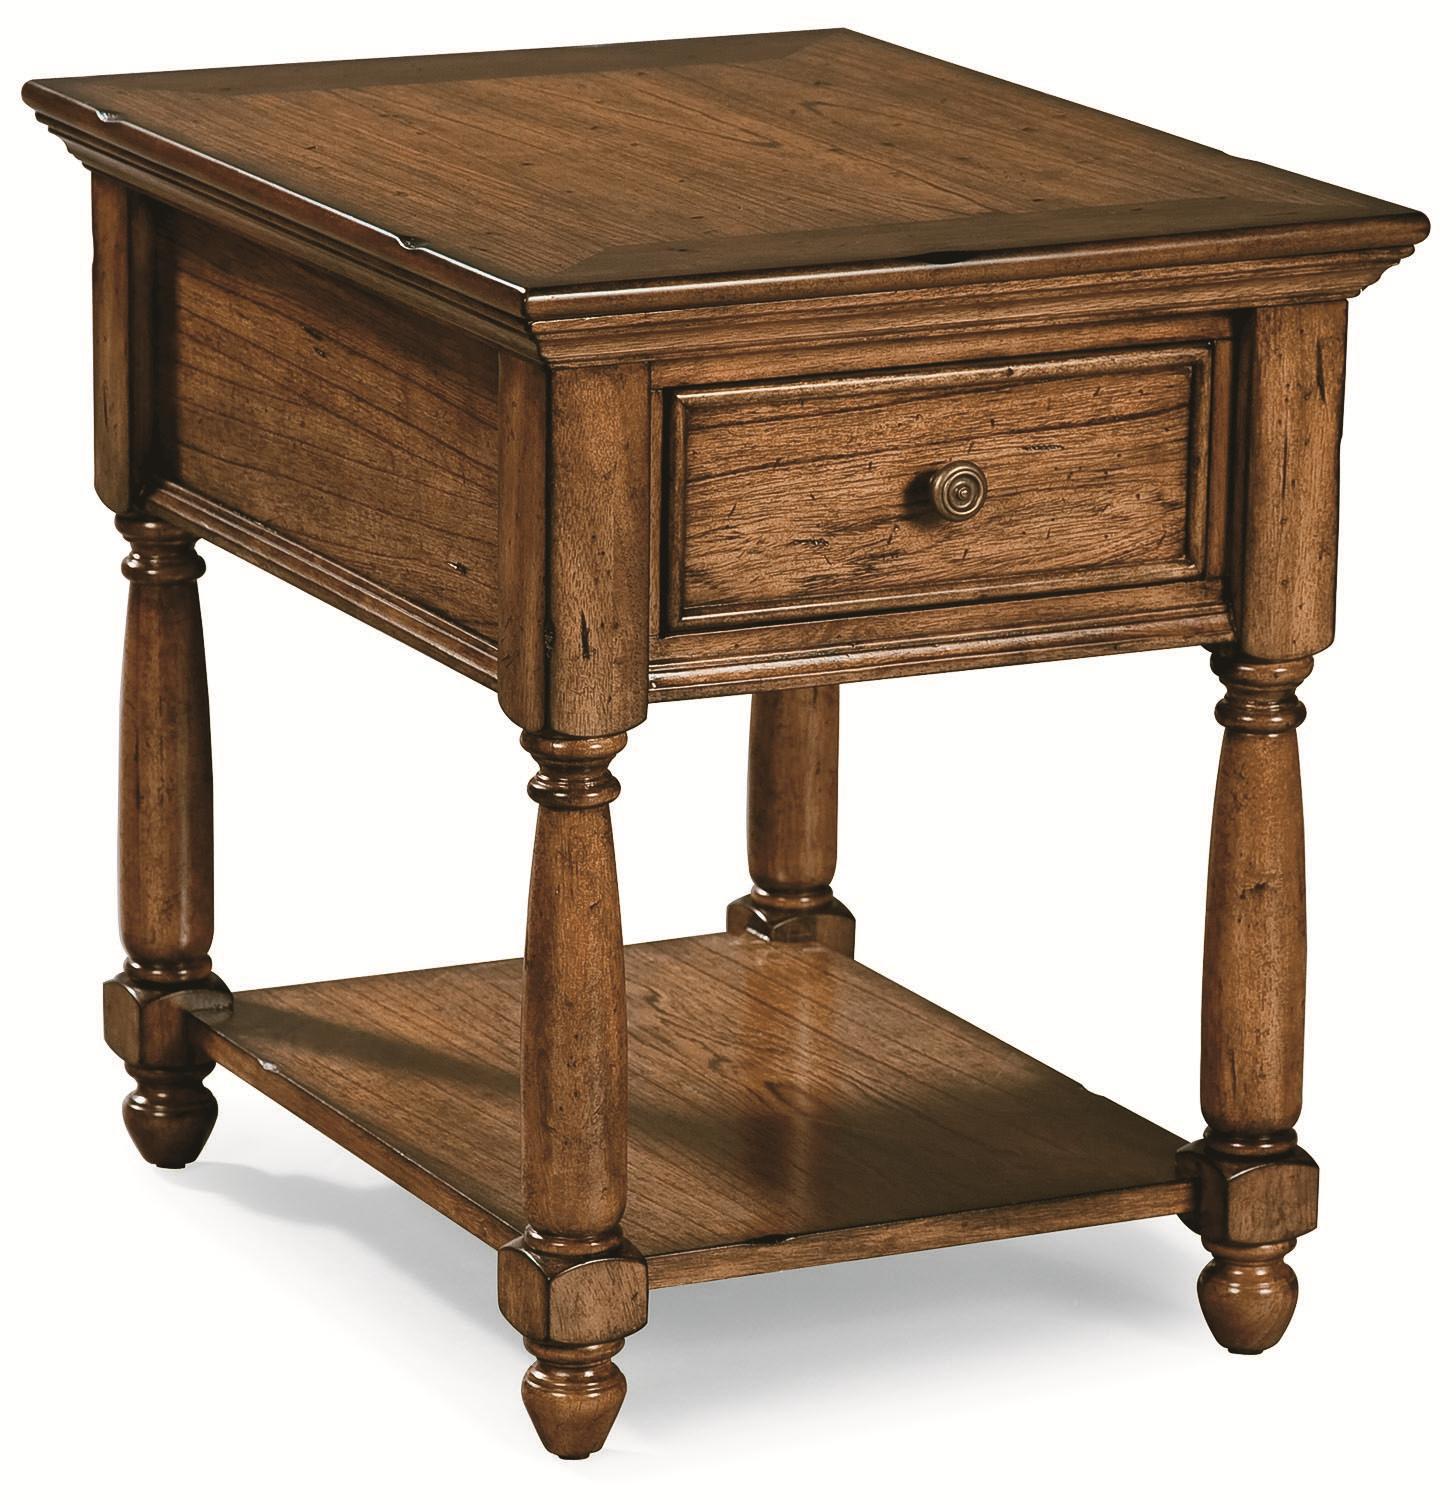 Peters Revington Briarwood End Table With Drawer U0026 Shelf